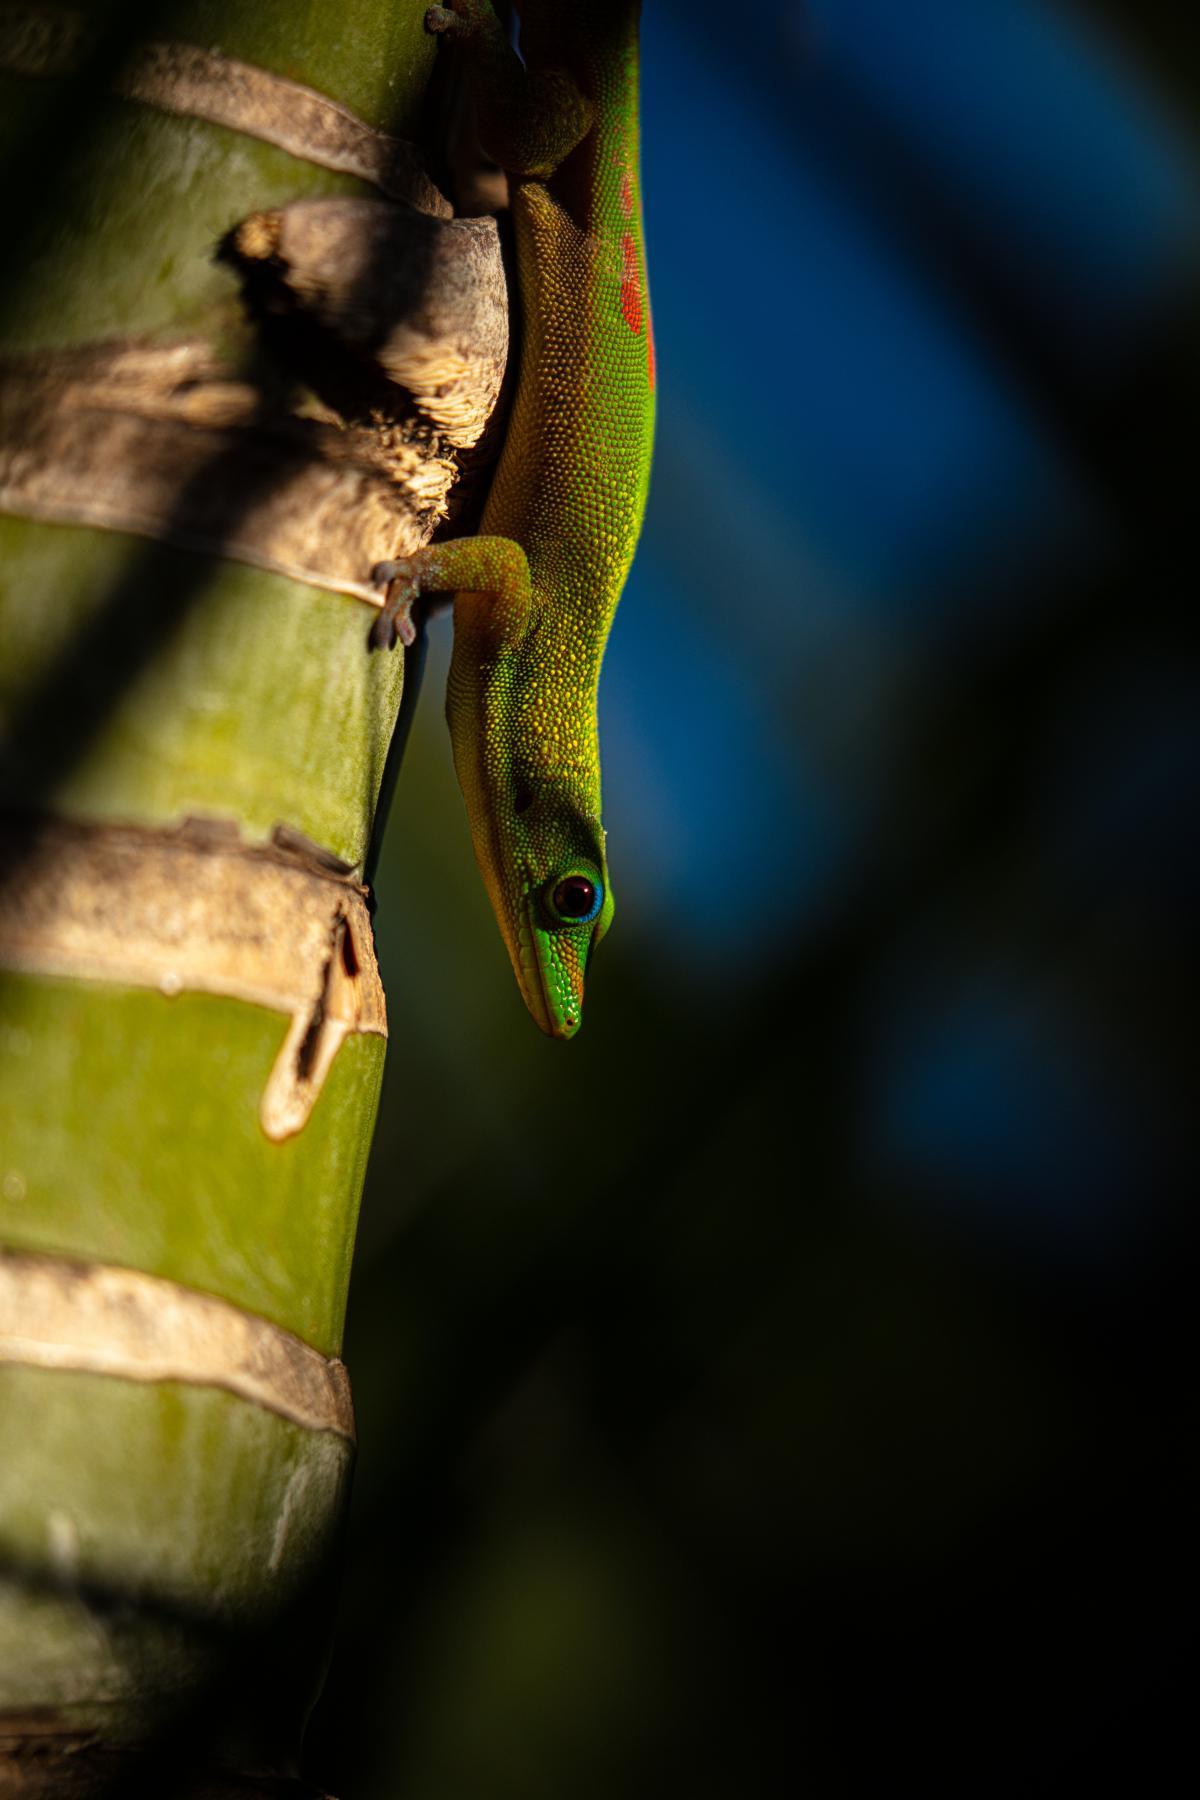 Lizard Green lizard Snake